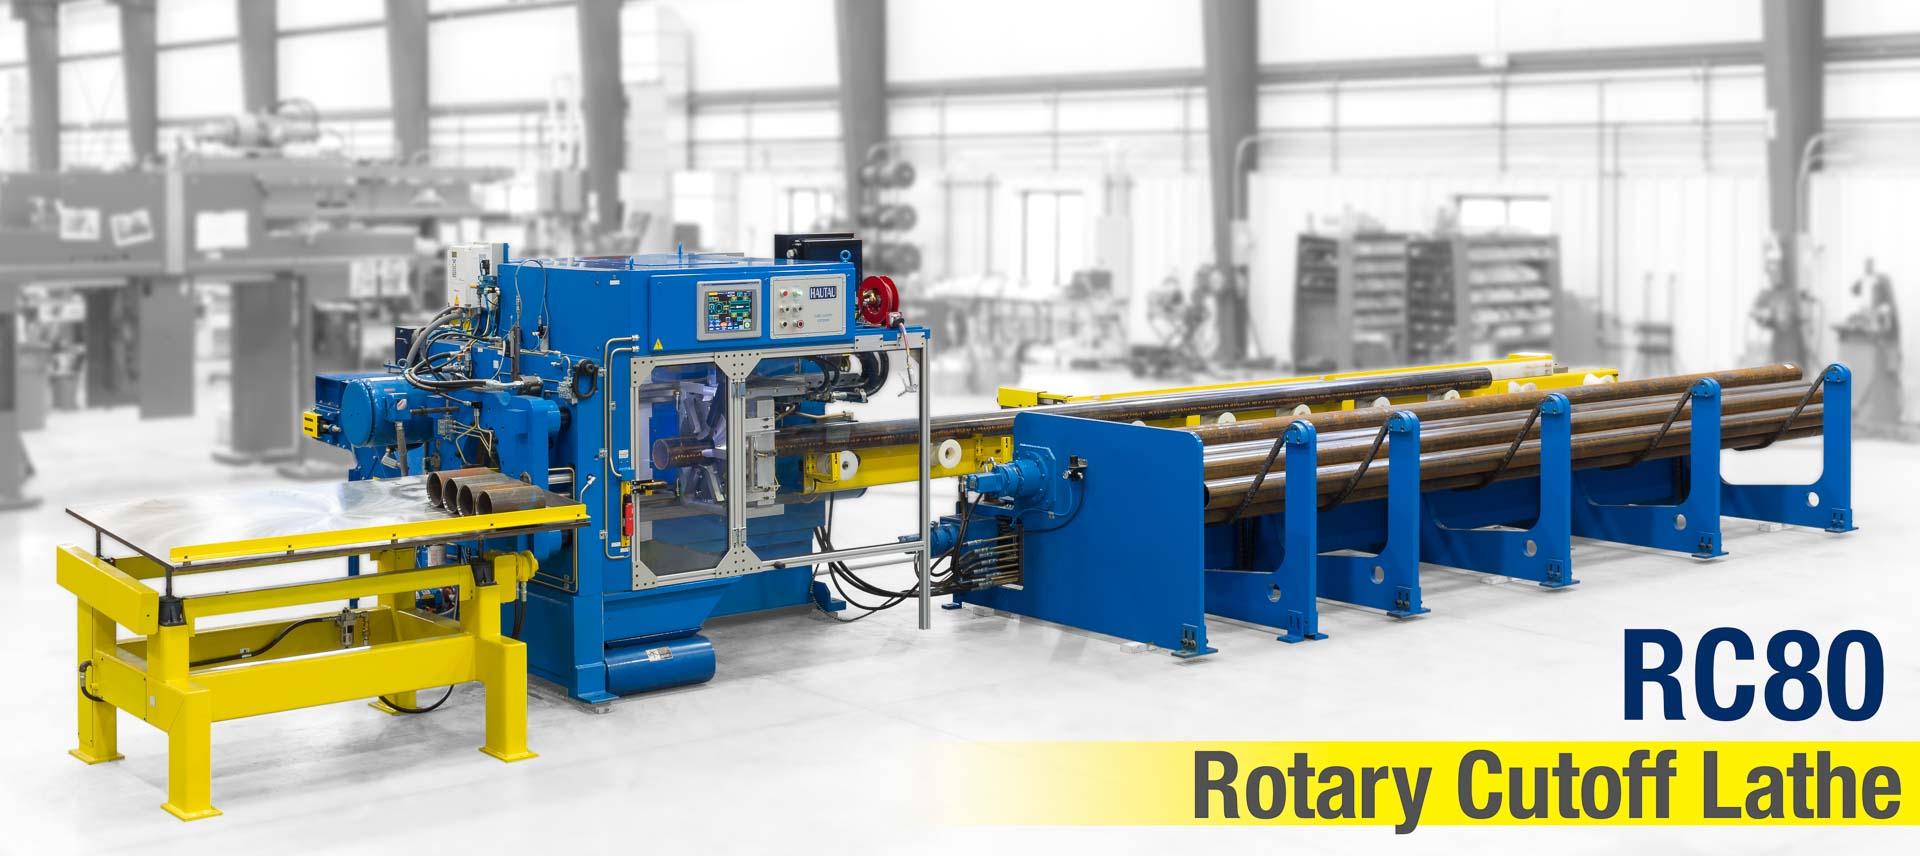 rc80-rotating-head-cutoff